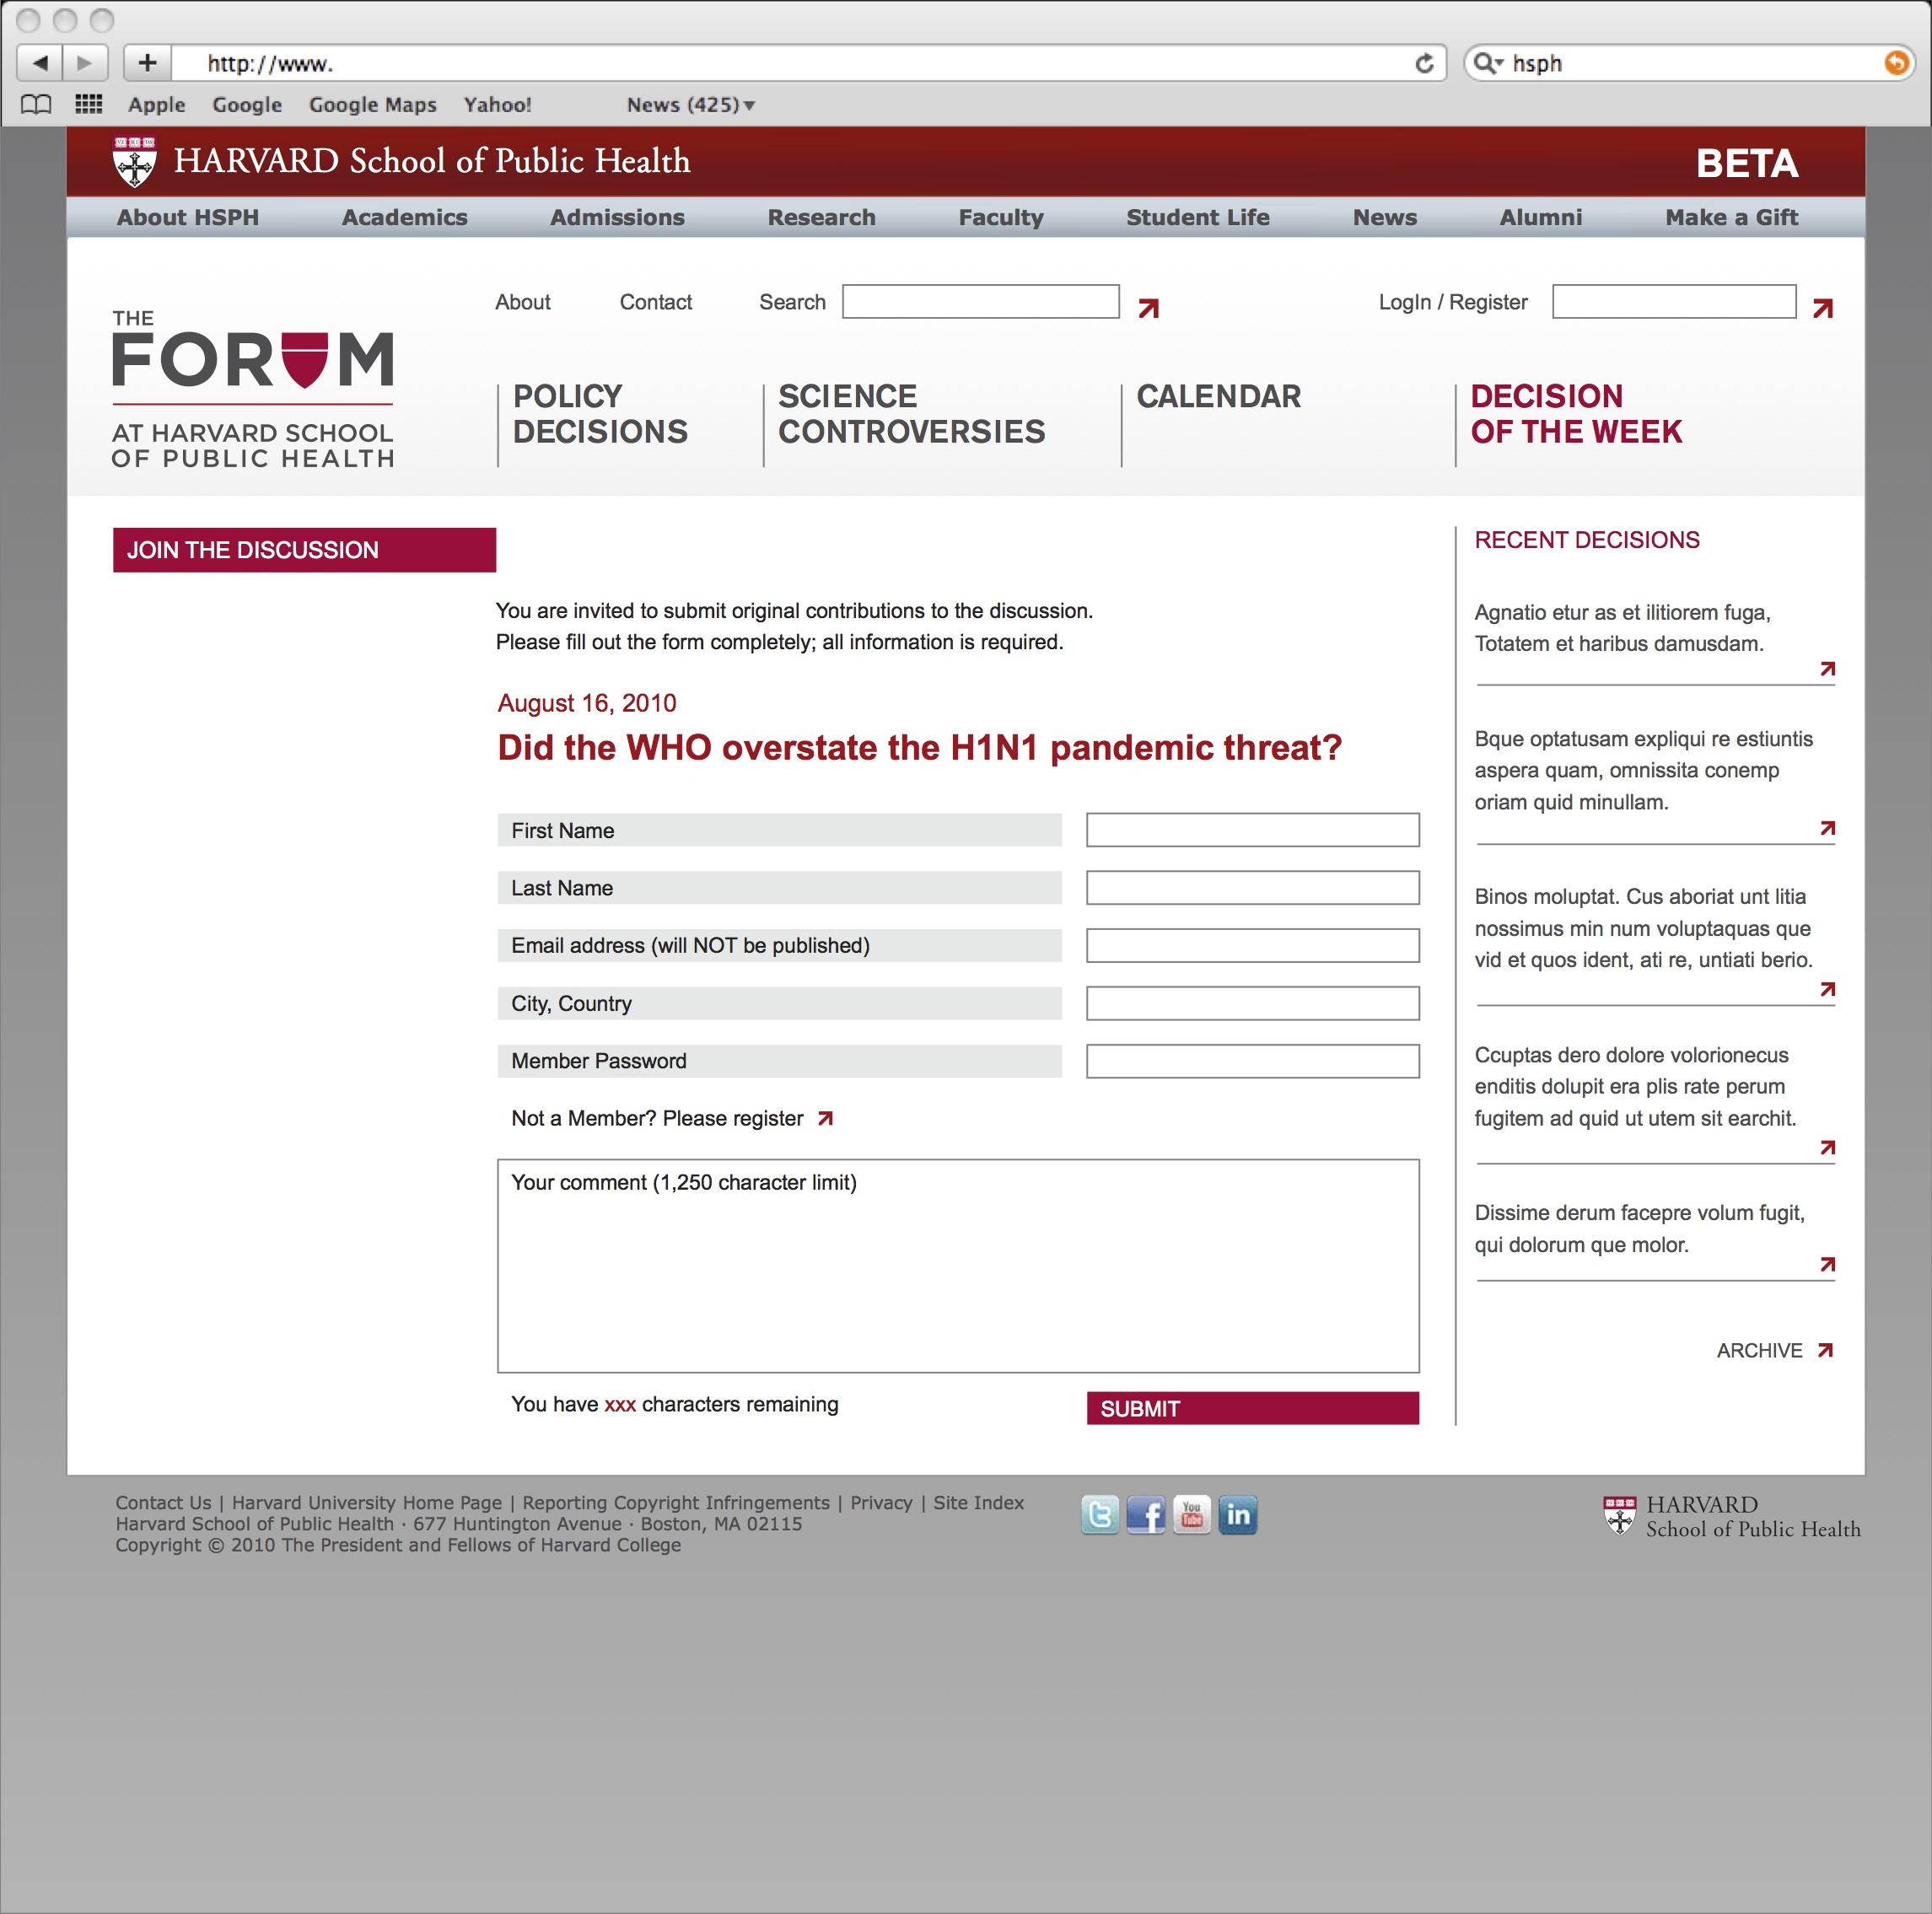 8_FORUM_WEB_4_JOIN_08-20.jpg